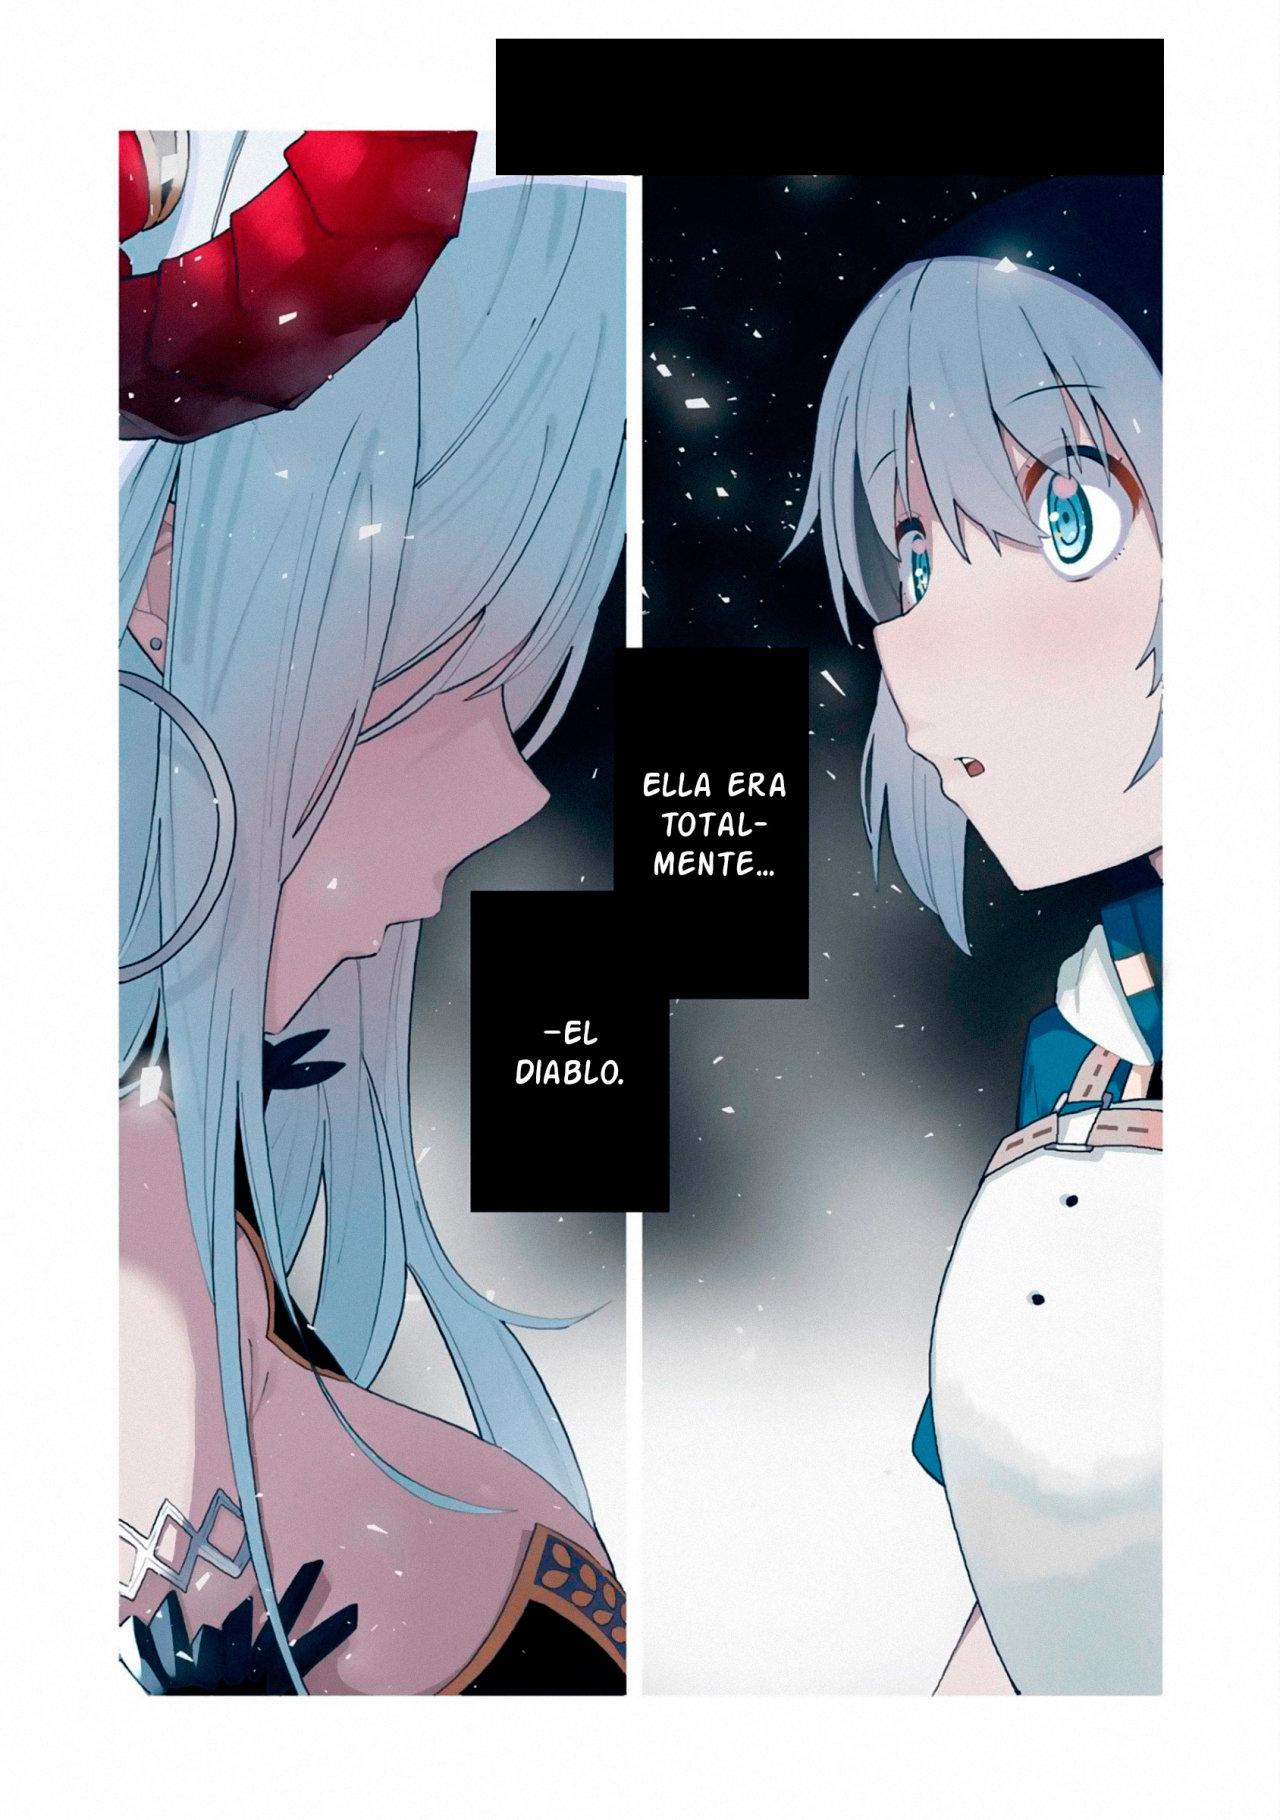 https://nine.mangadogs.com/es_manga/pic9/11/37515/966619/5b18e1a3e2092783aea4b1aa4a894d8a.jpg Page 1